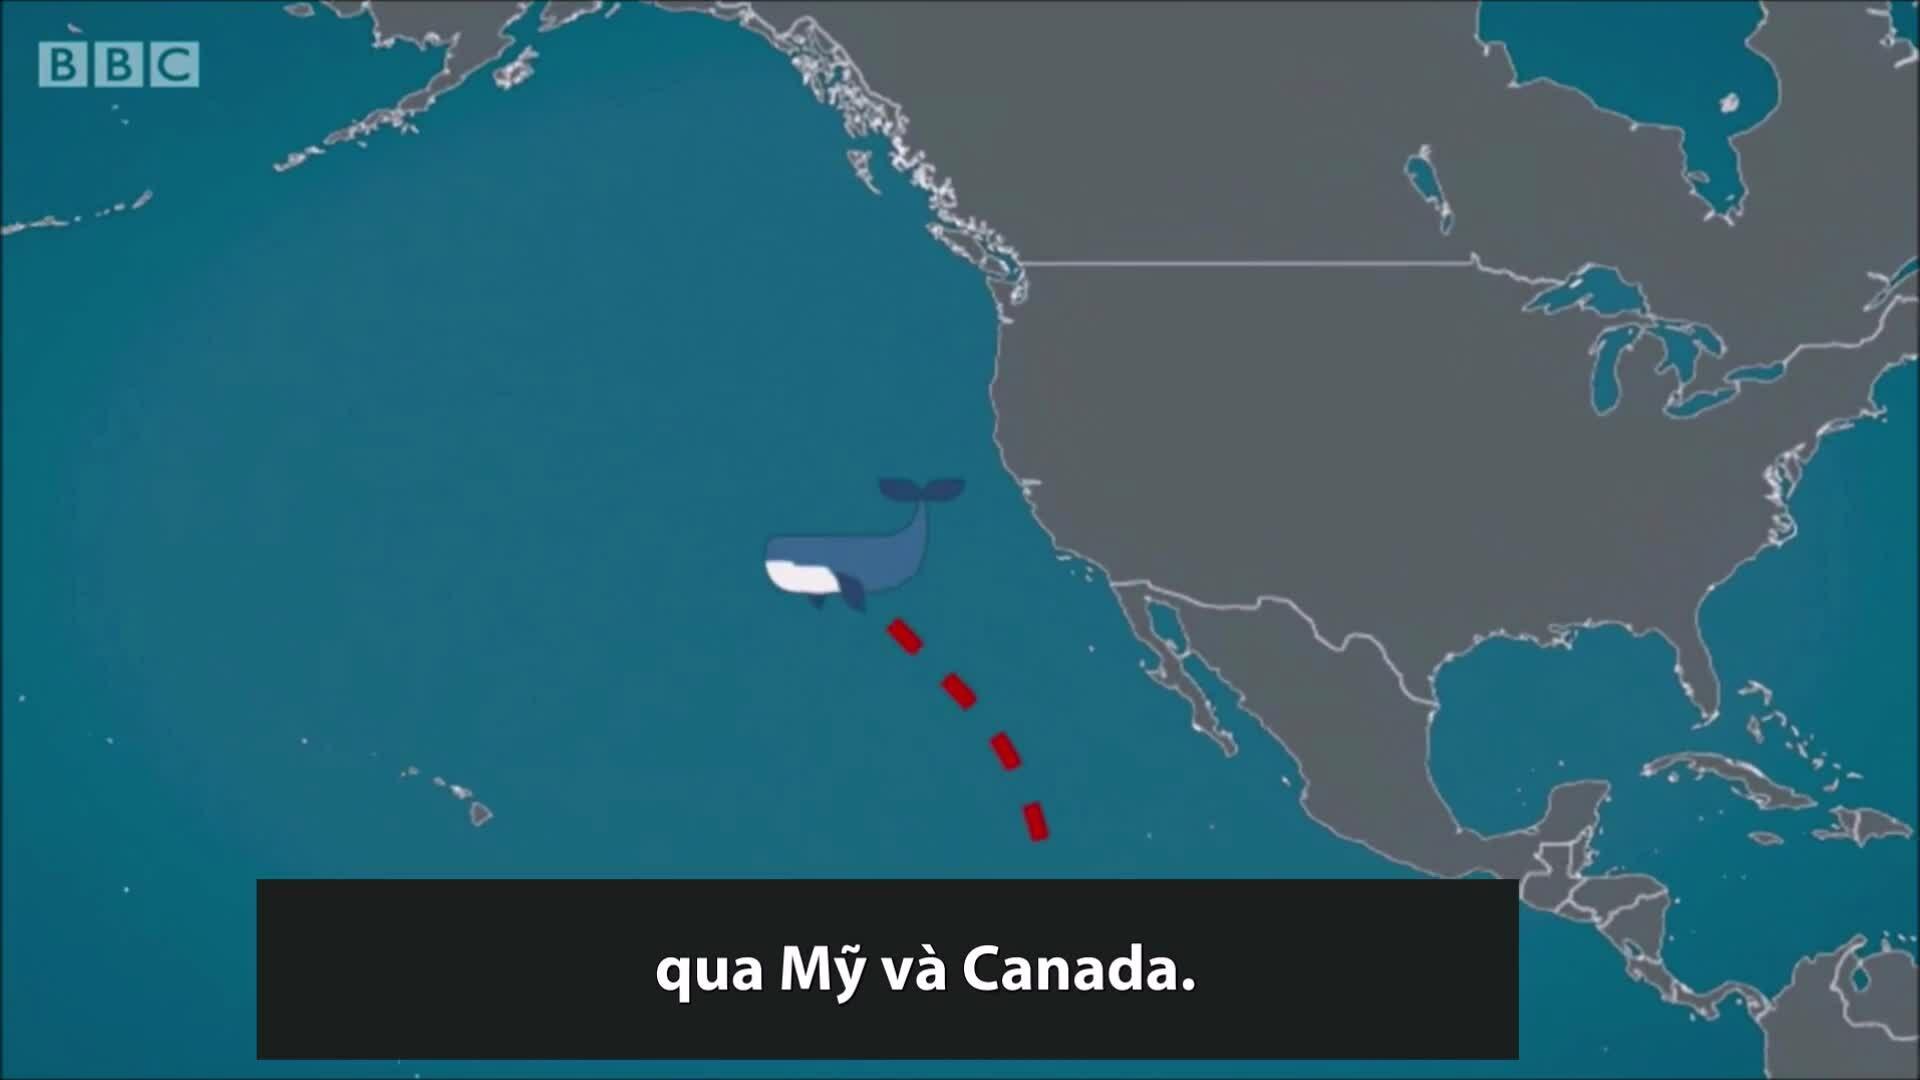 Cá voi xám đi lạc 9.000 km